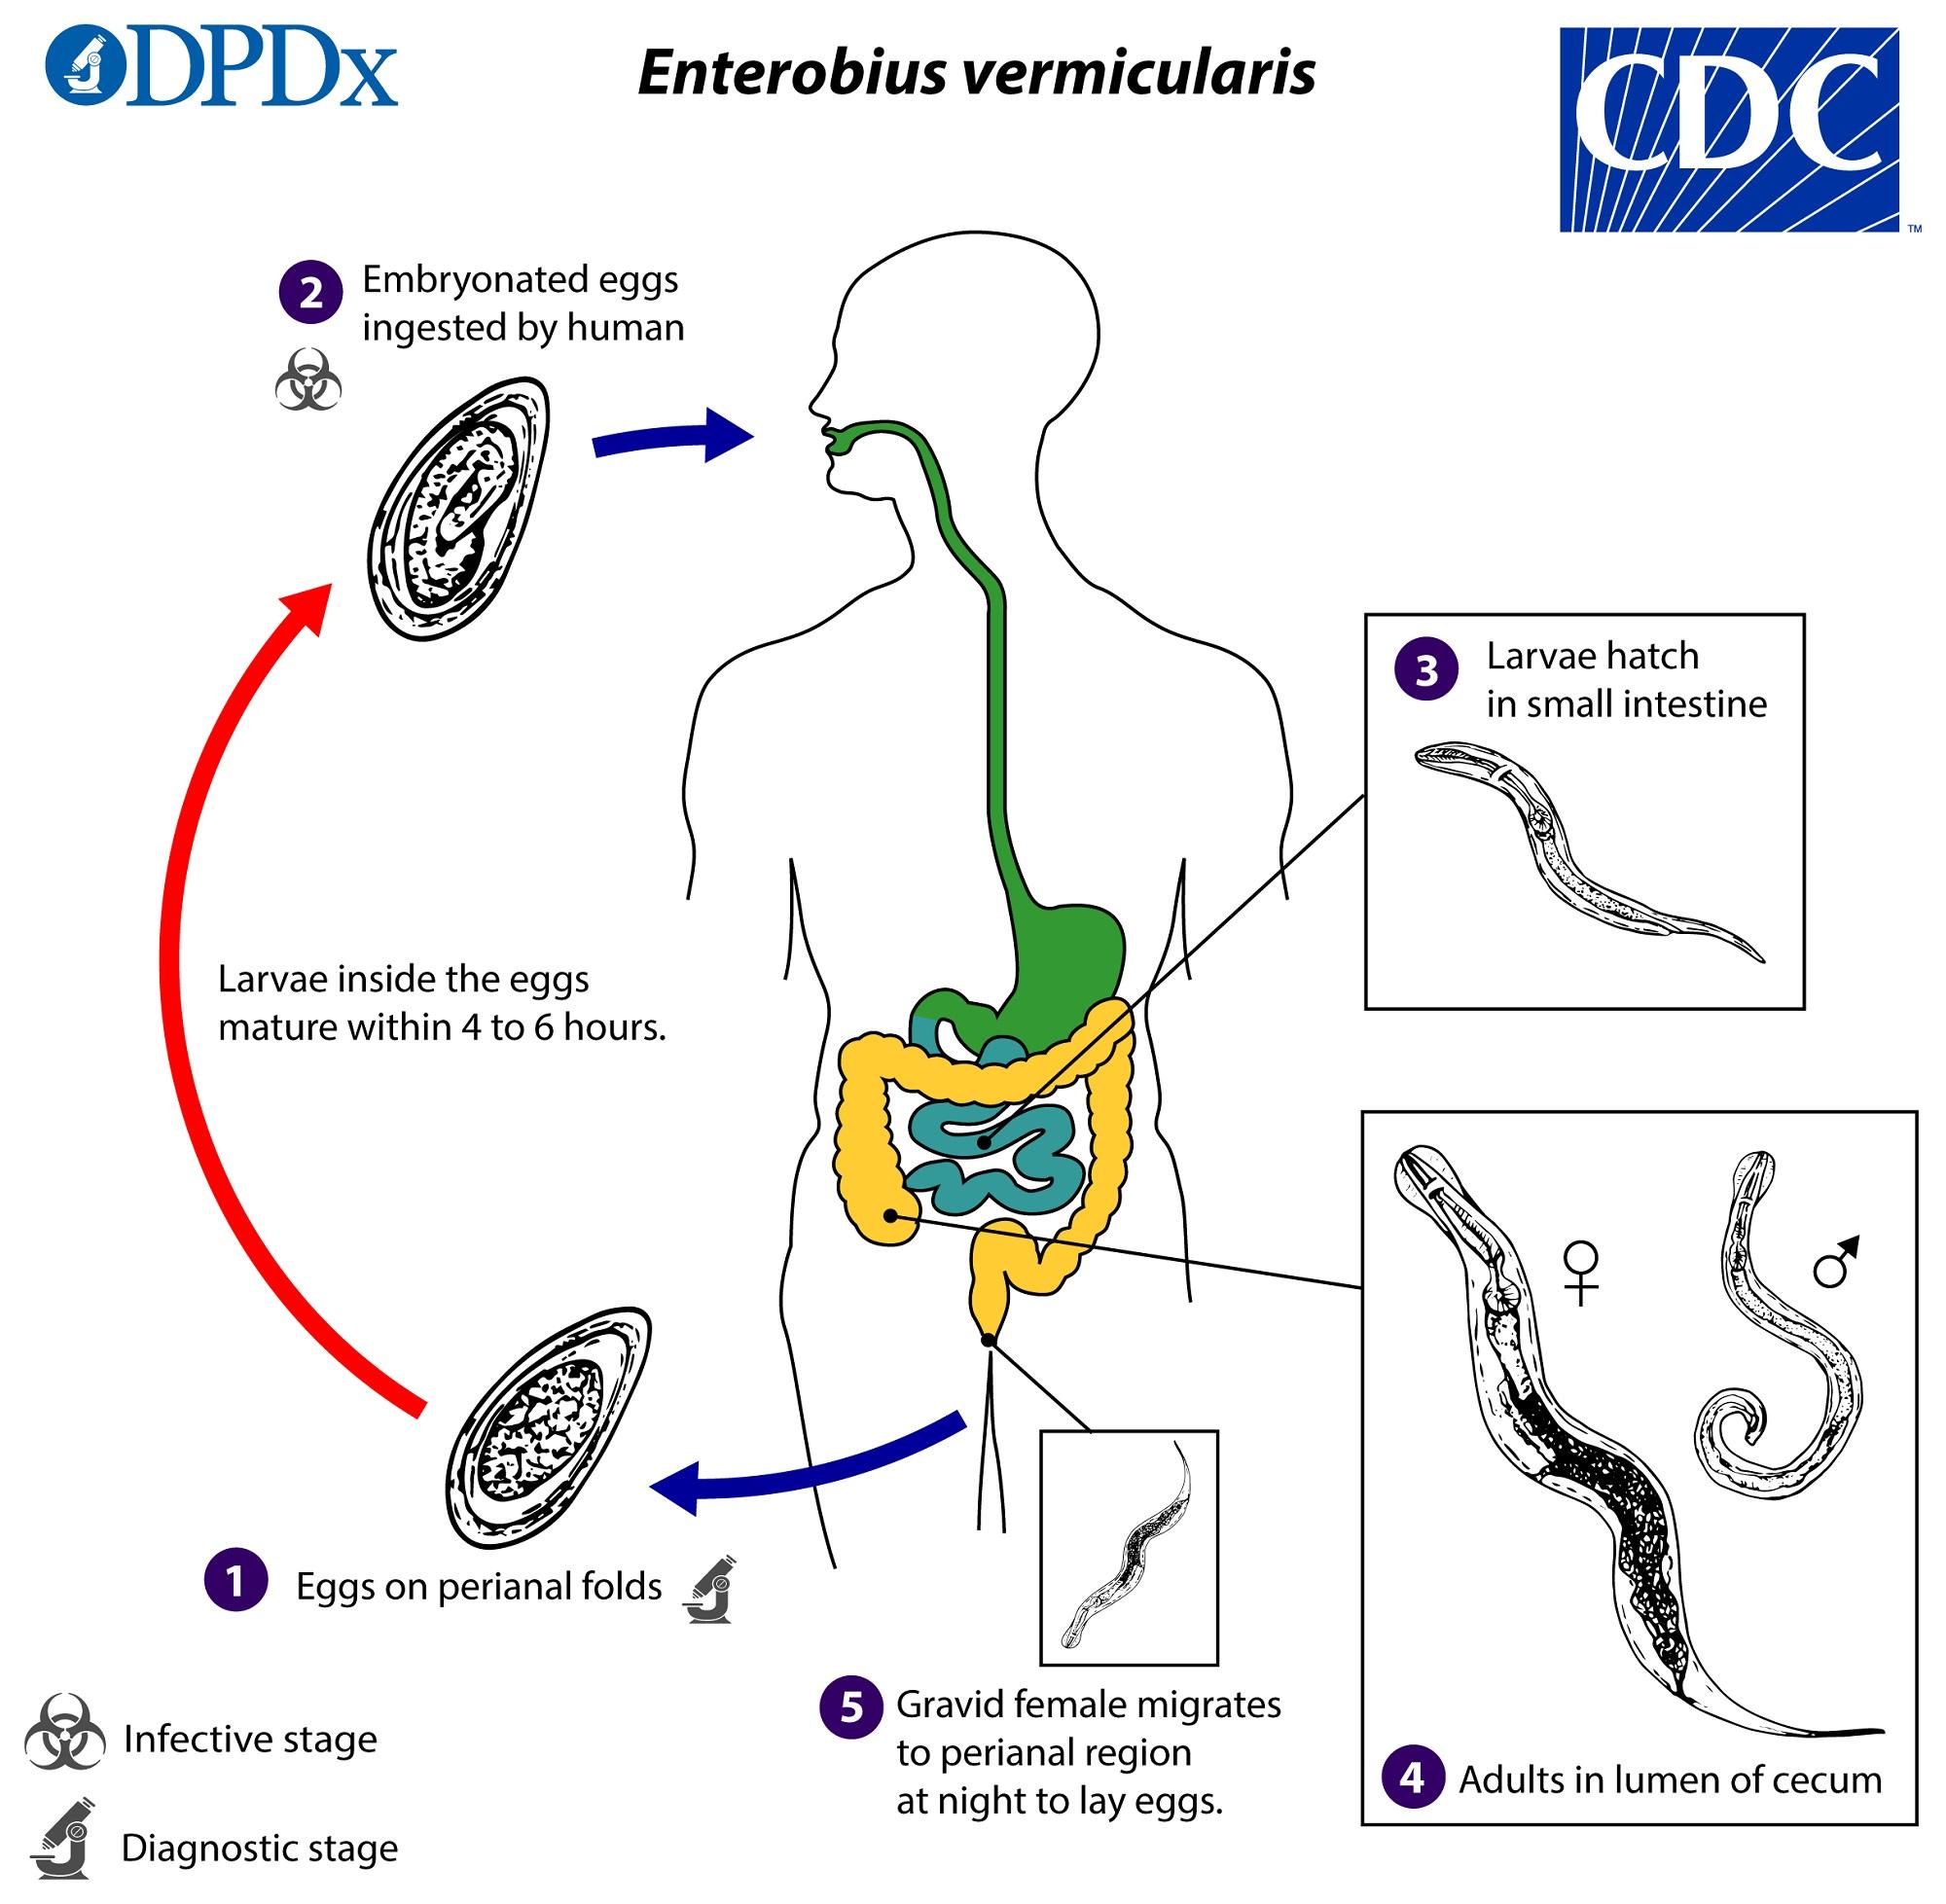 enterobius vermicularis éjszaka